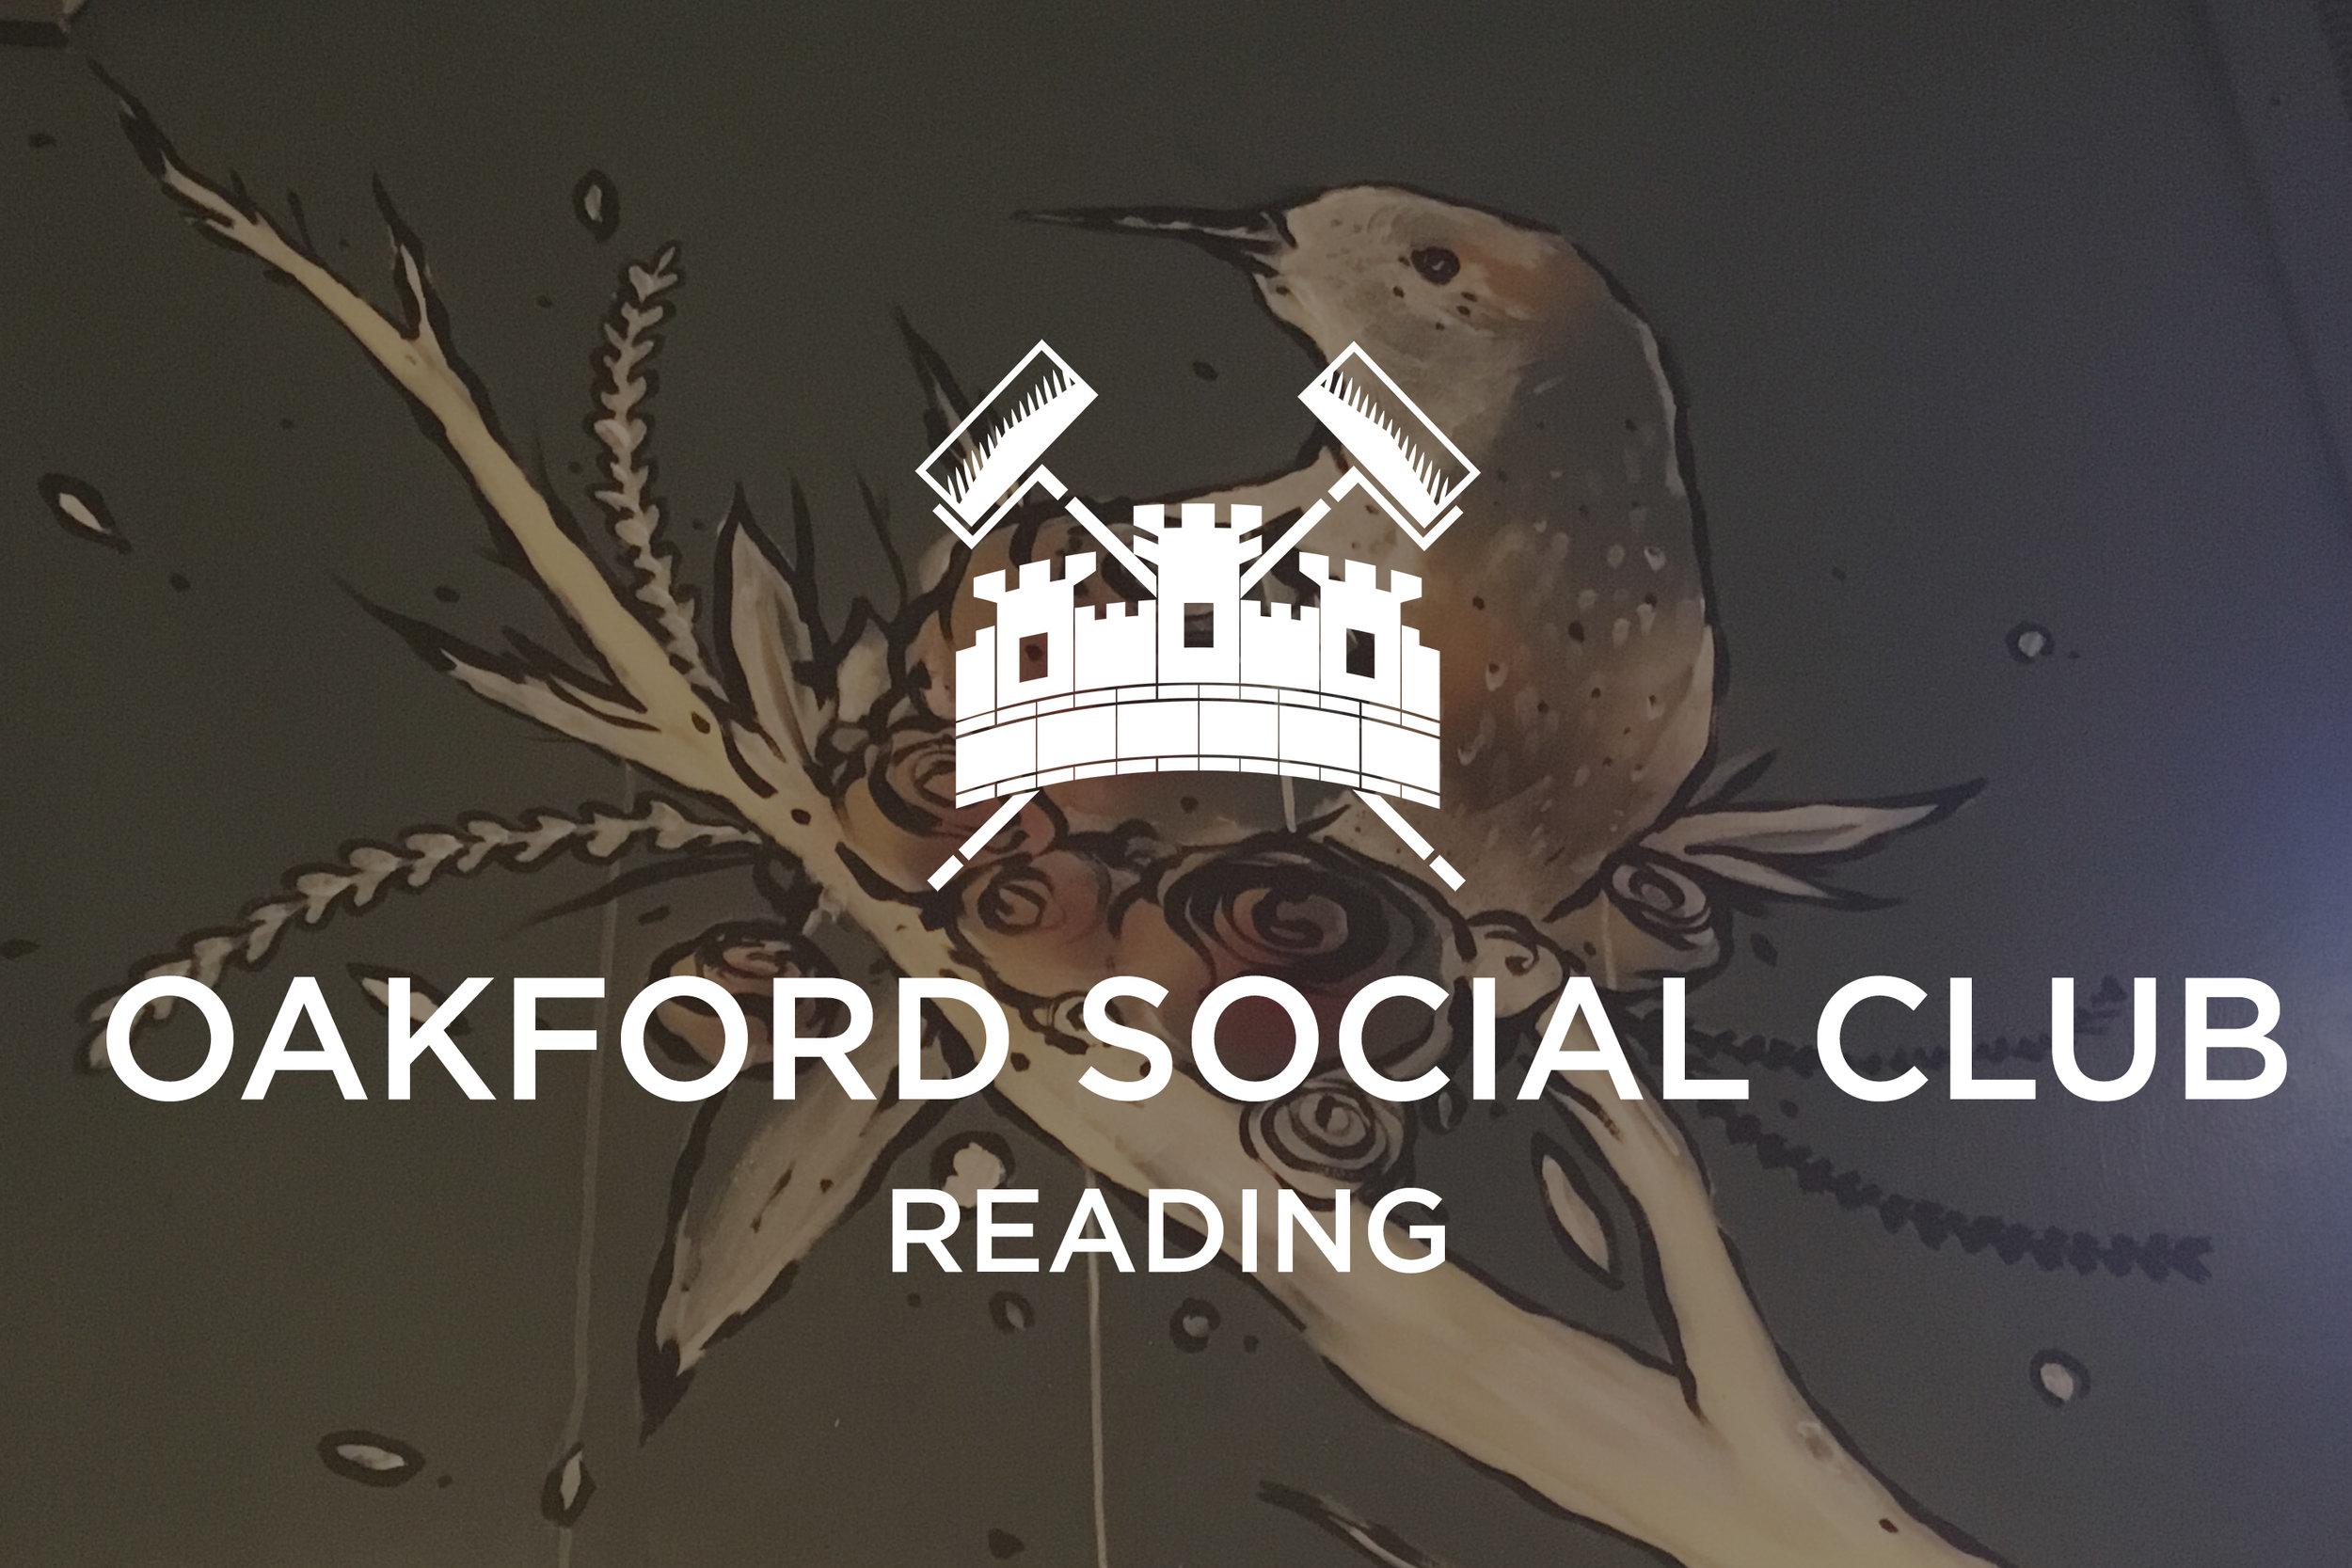 Oakford Social Club x The London Mural Company